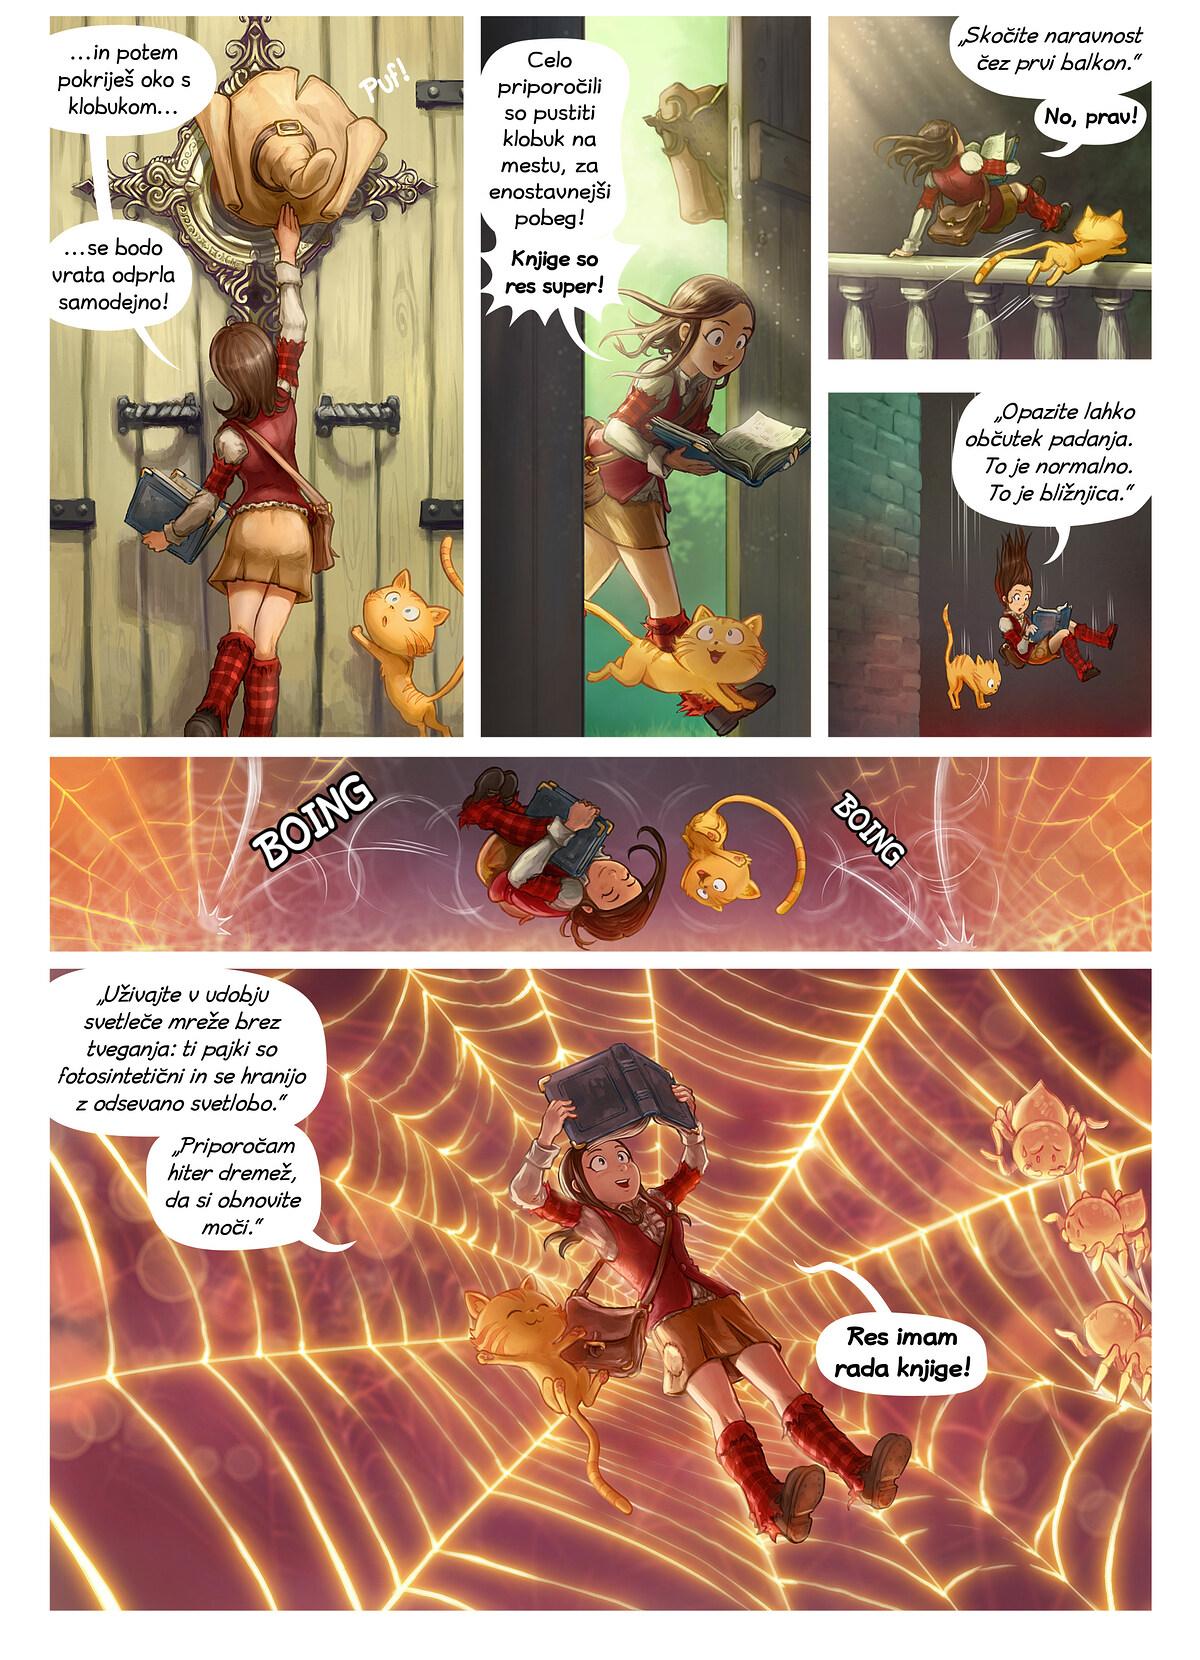 Epizoda 26: Knjige so super, Page 2